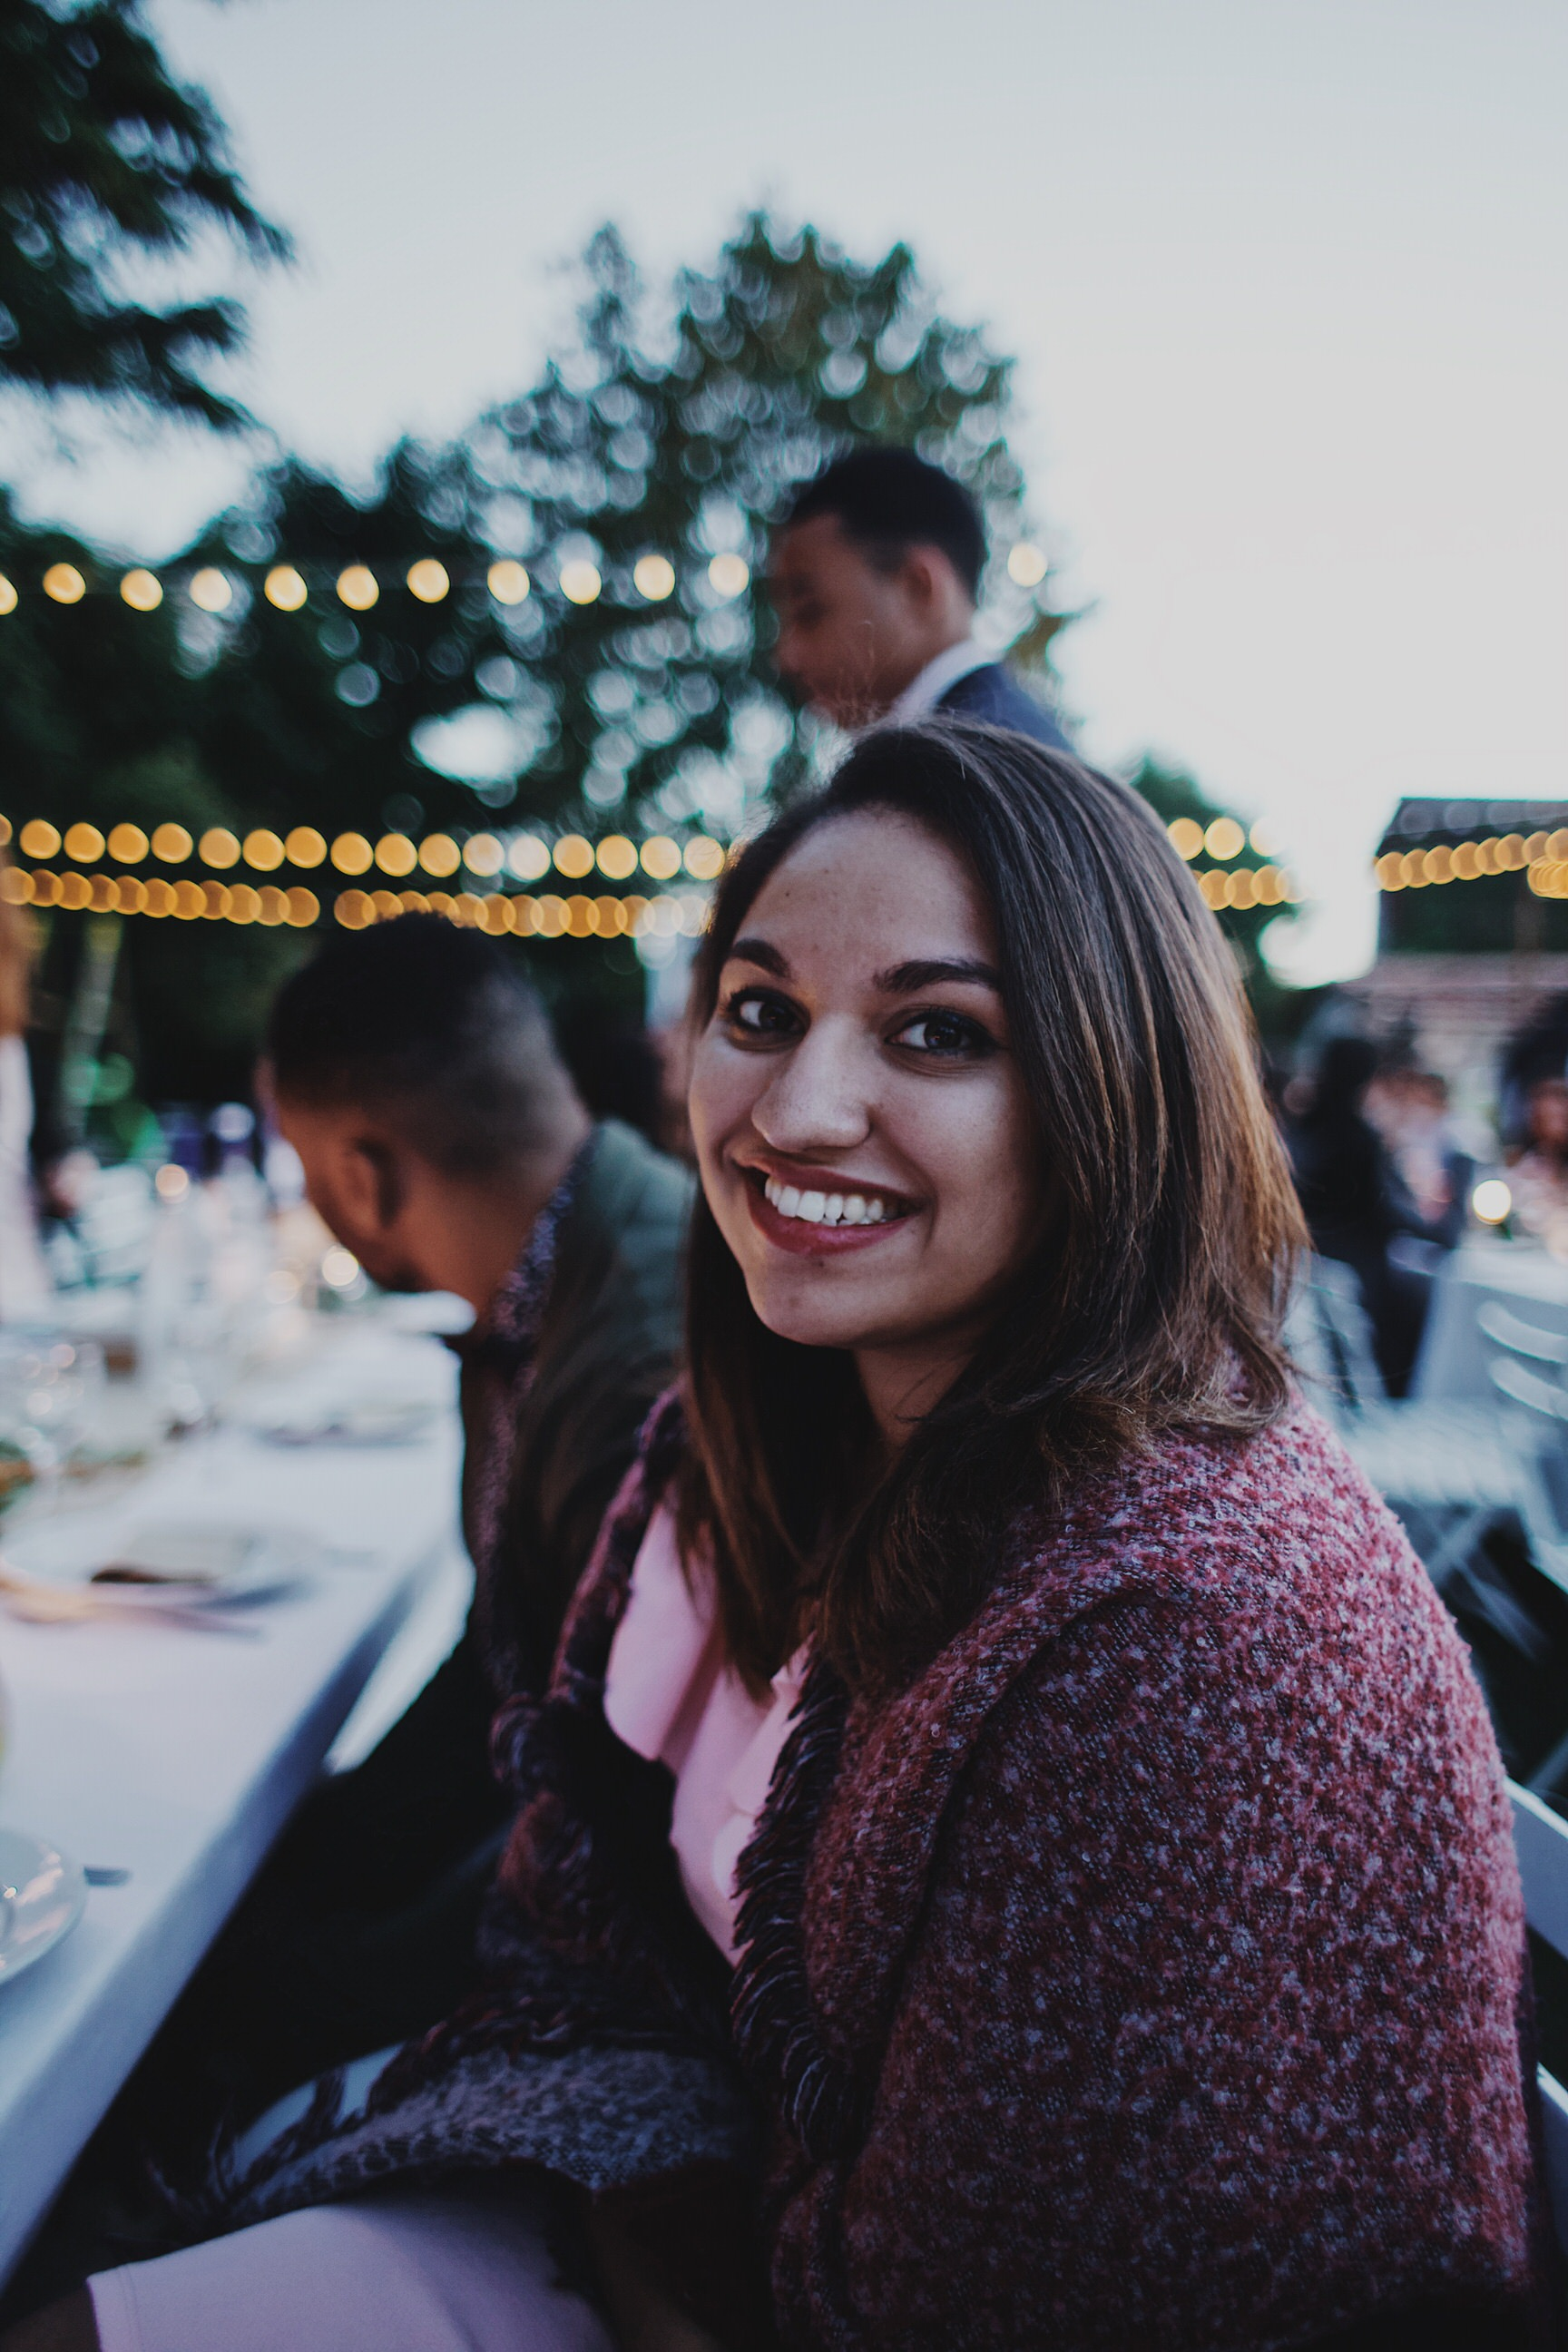 Ghania-iratni-photographe